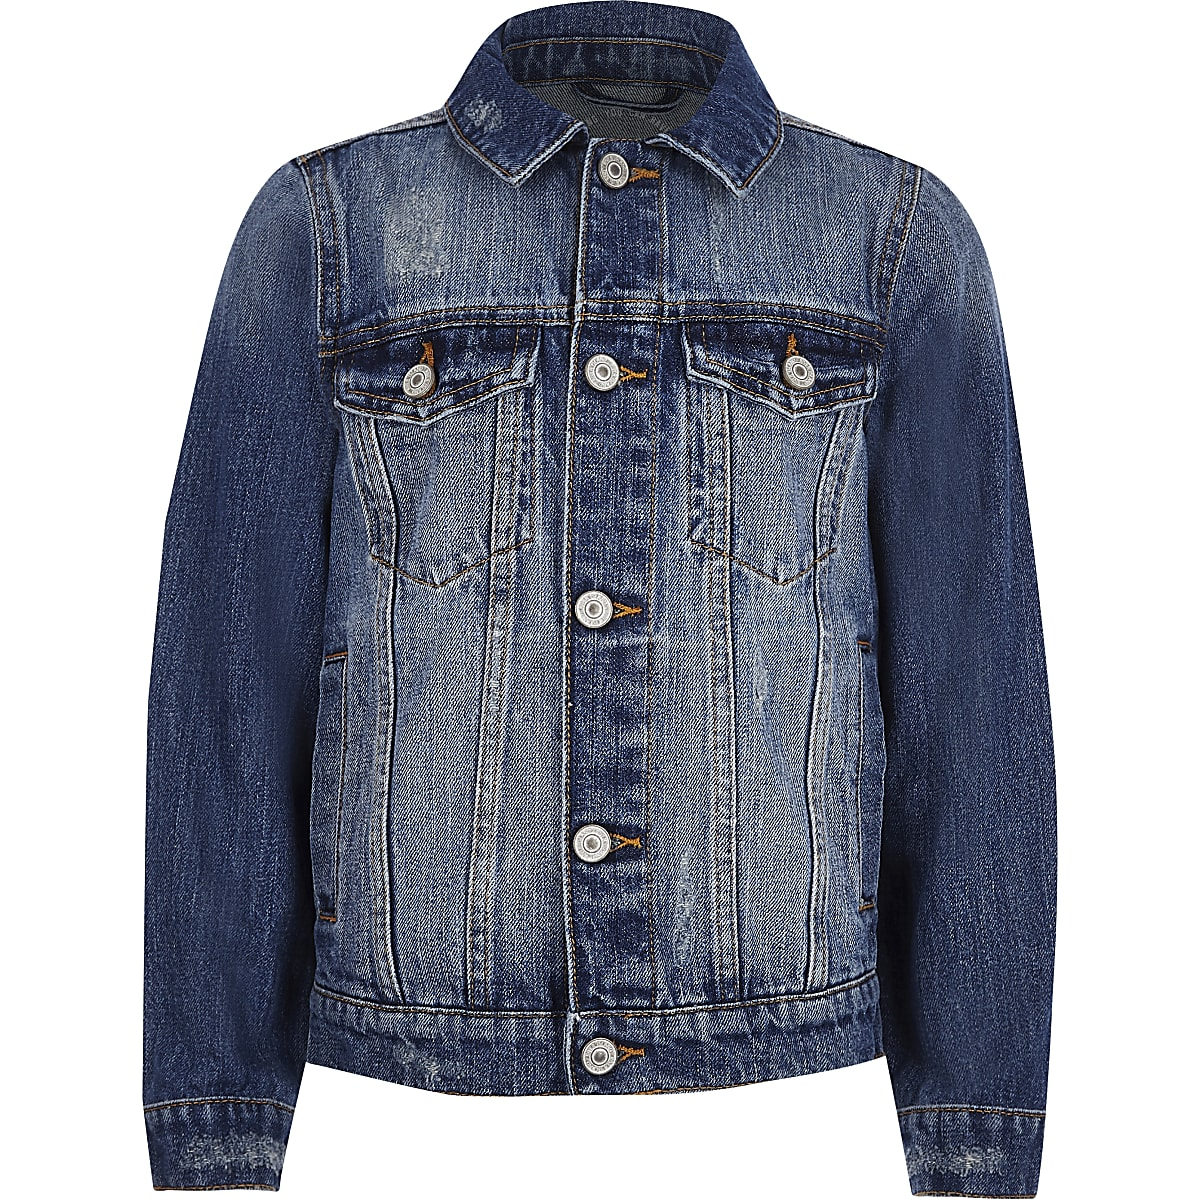 Boys blue distressed denim jacket